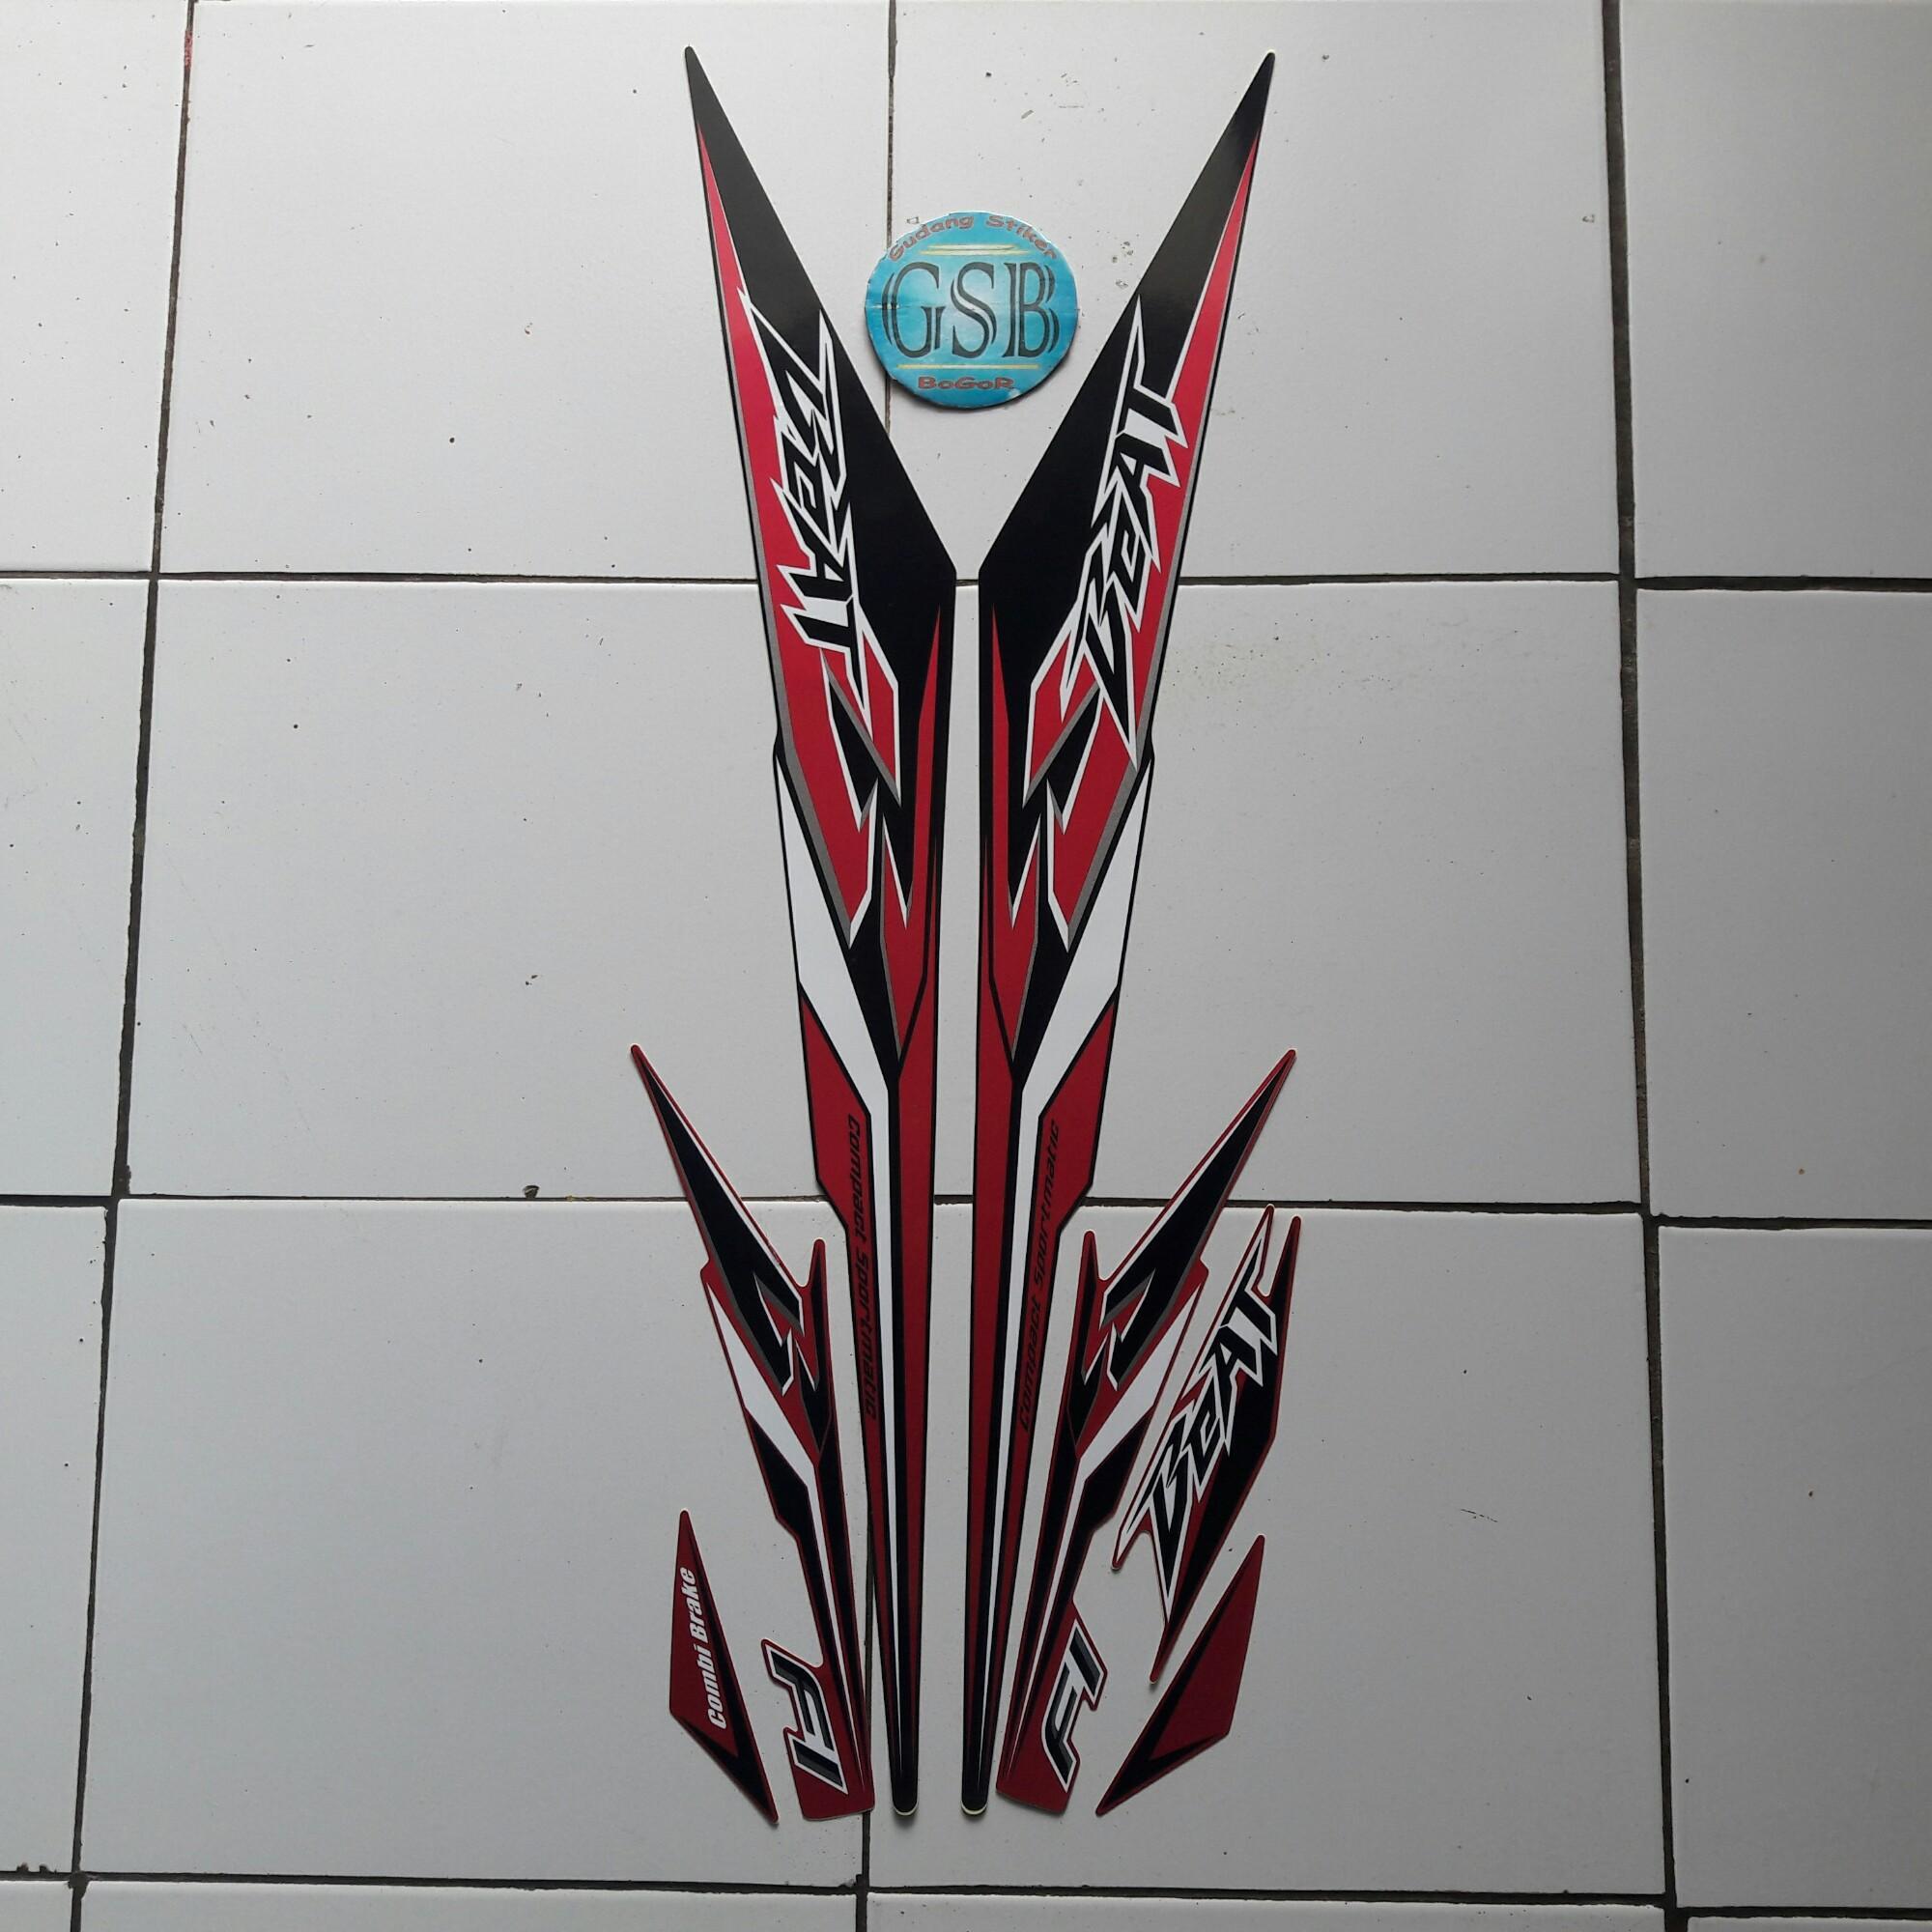 Kelebihan Cover Motor Honda Beat Sporty Cbs Iss Merah Terkini New Vario 110 Esp Grande White Jakarta Stiker Striping Fi Thailand 2018 Hitam Ungu